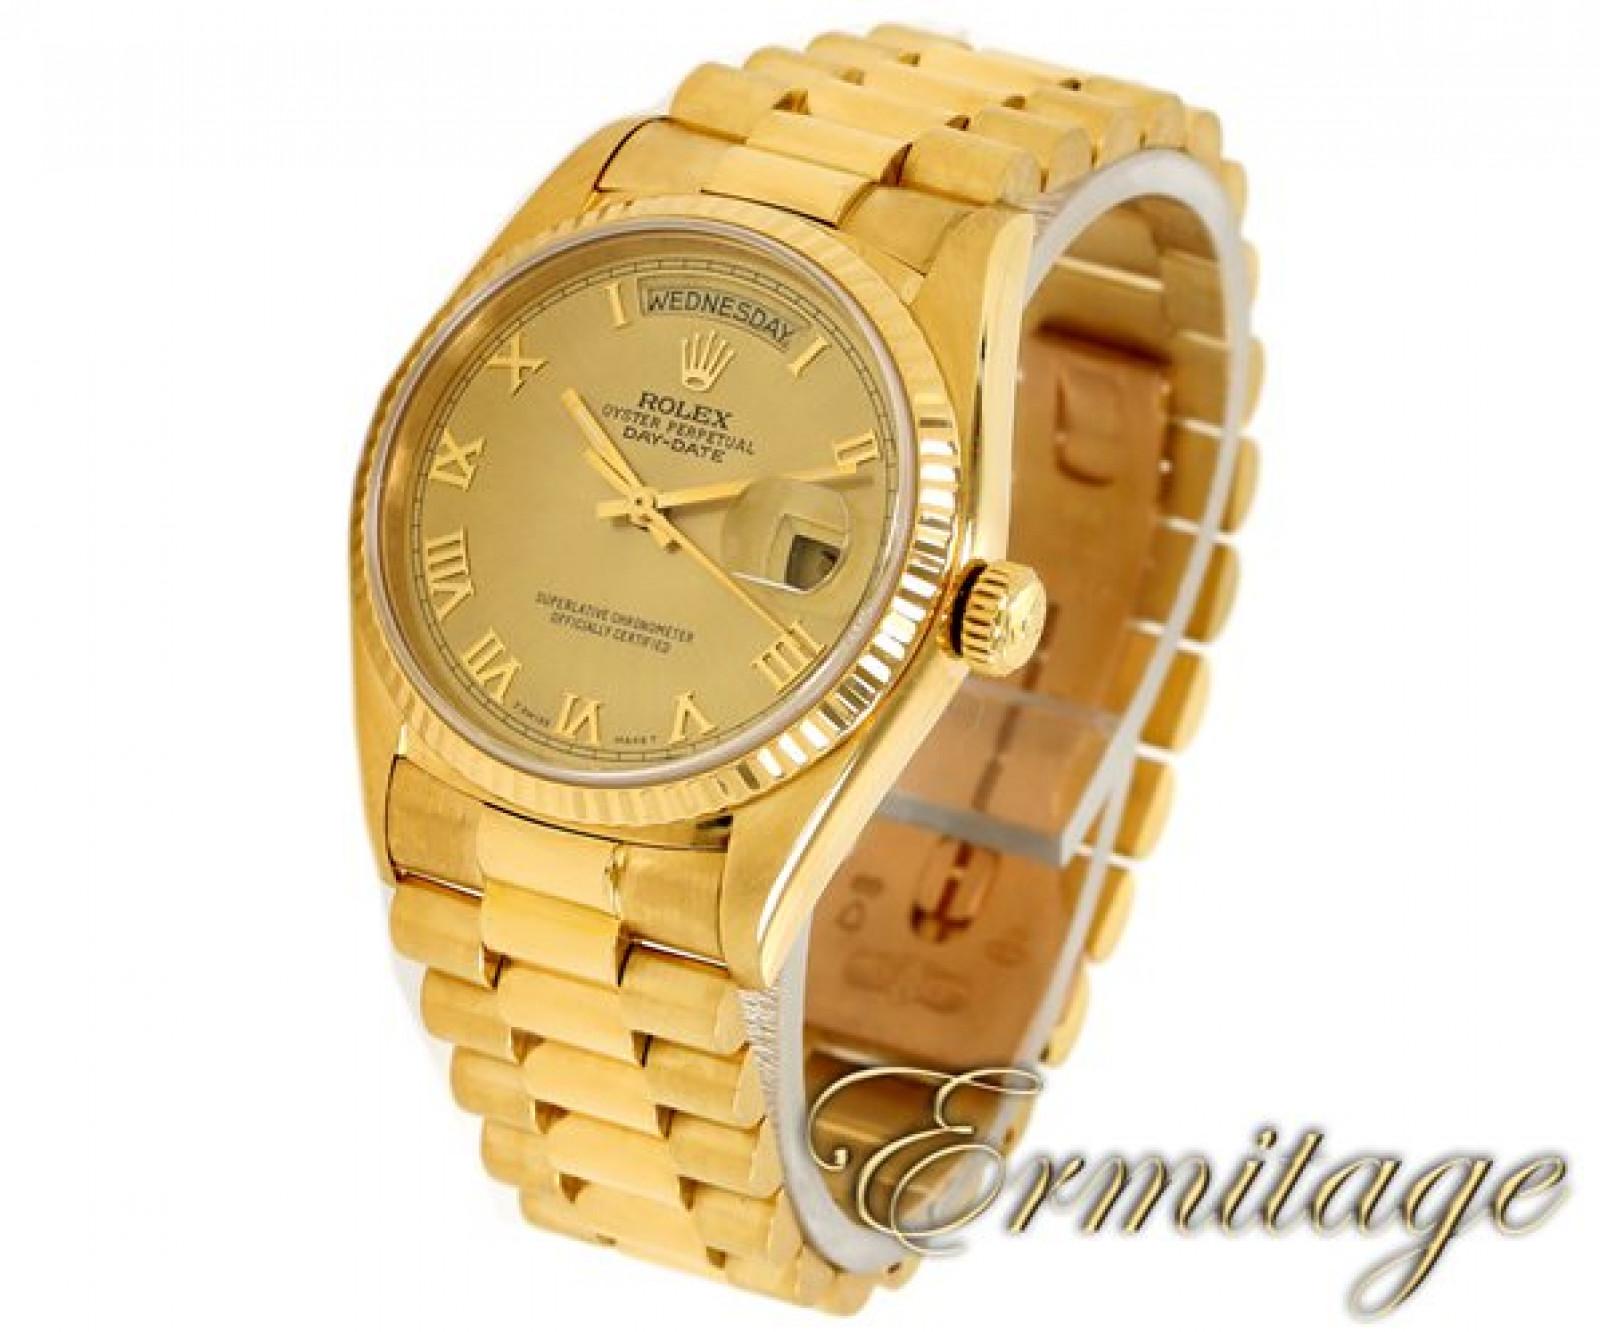 Rolex Day-Date 18038 Gold Champagne